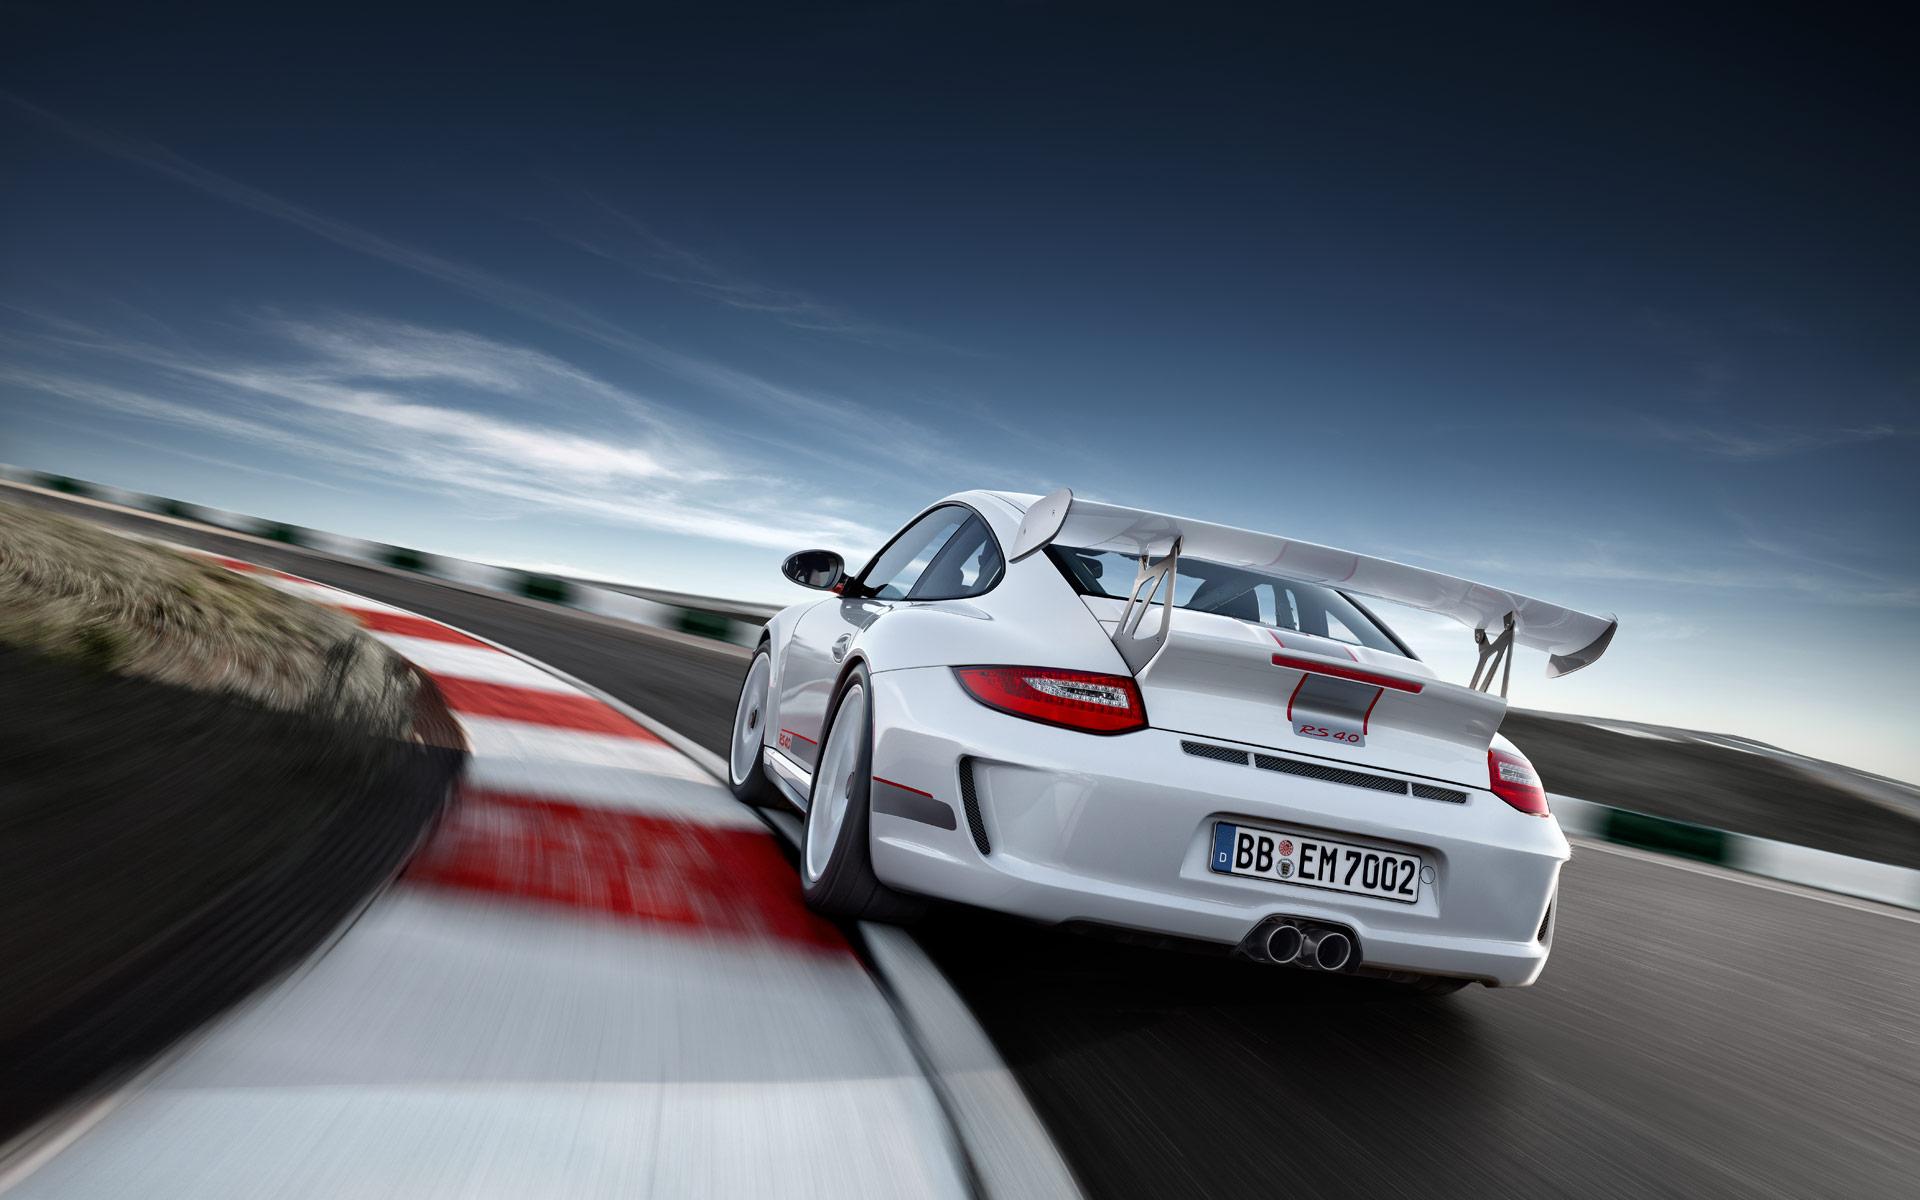 Limited White 2011 Porsche 911 GT3 RS 4 0 wallpaper Rear view